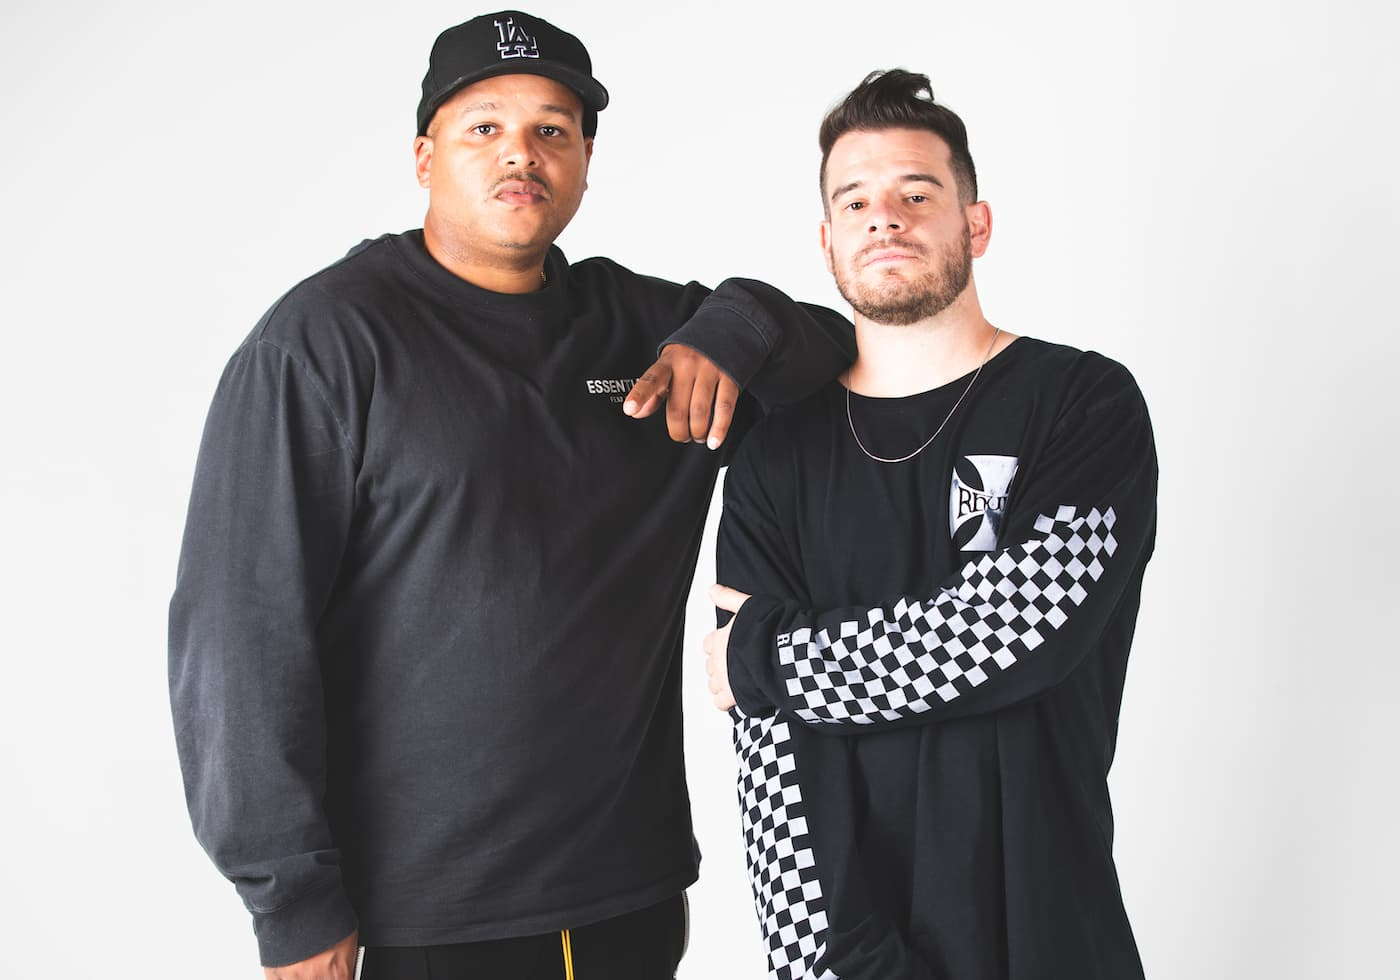 Dominic DJ Jordan and Jimmy Giannos